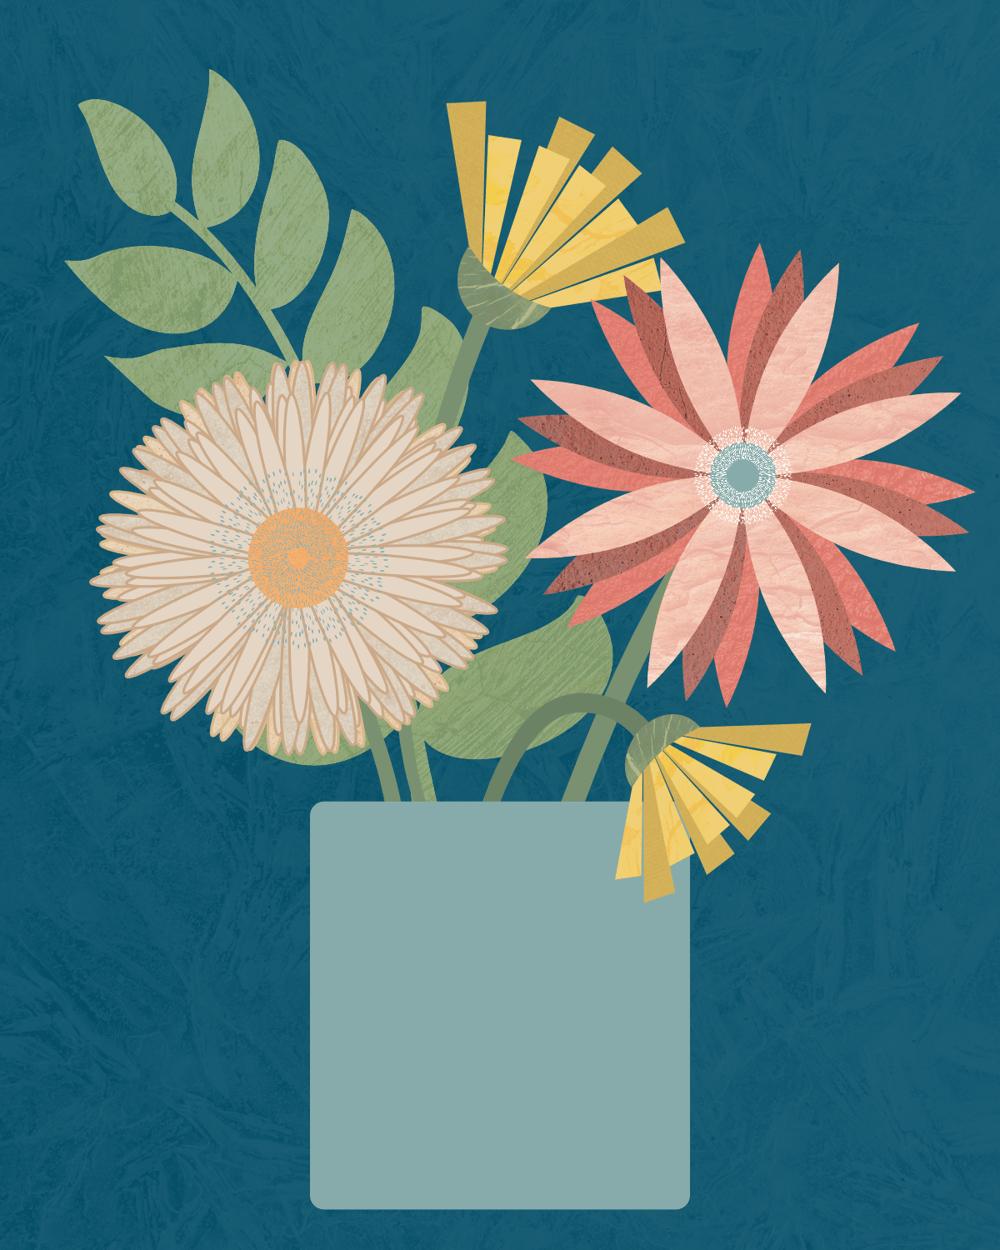 Florals in Affinity Designer - image 1 - student project